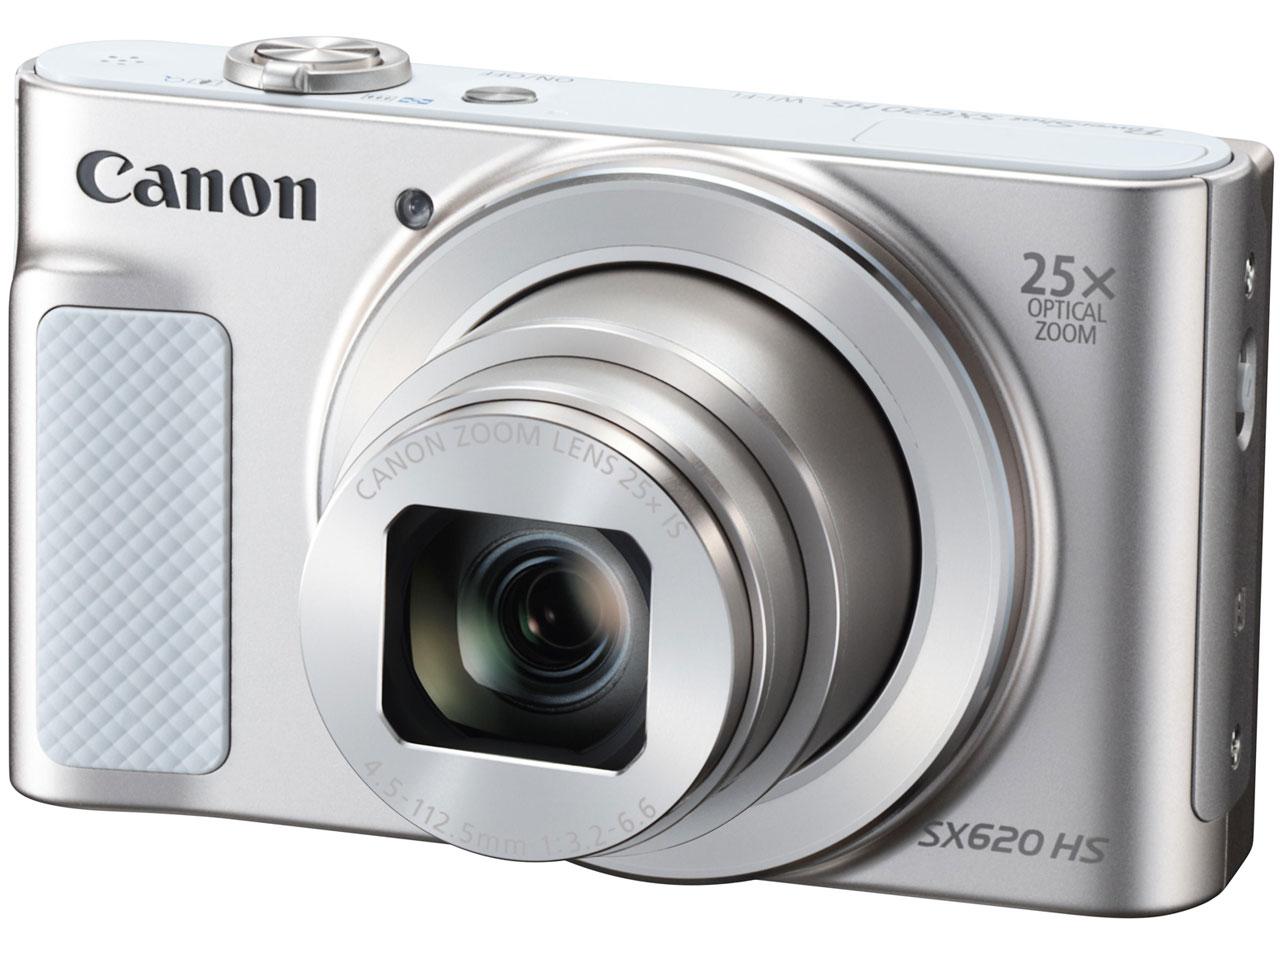 PowerShot SX620 HS の製品画像